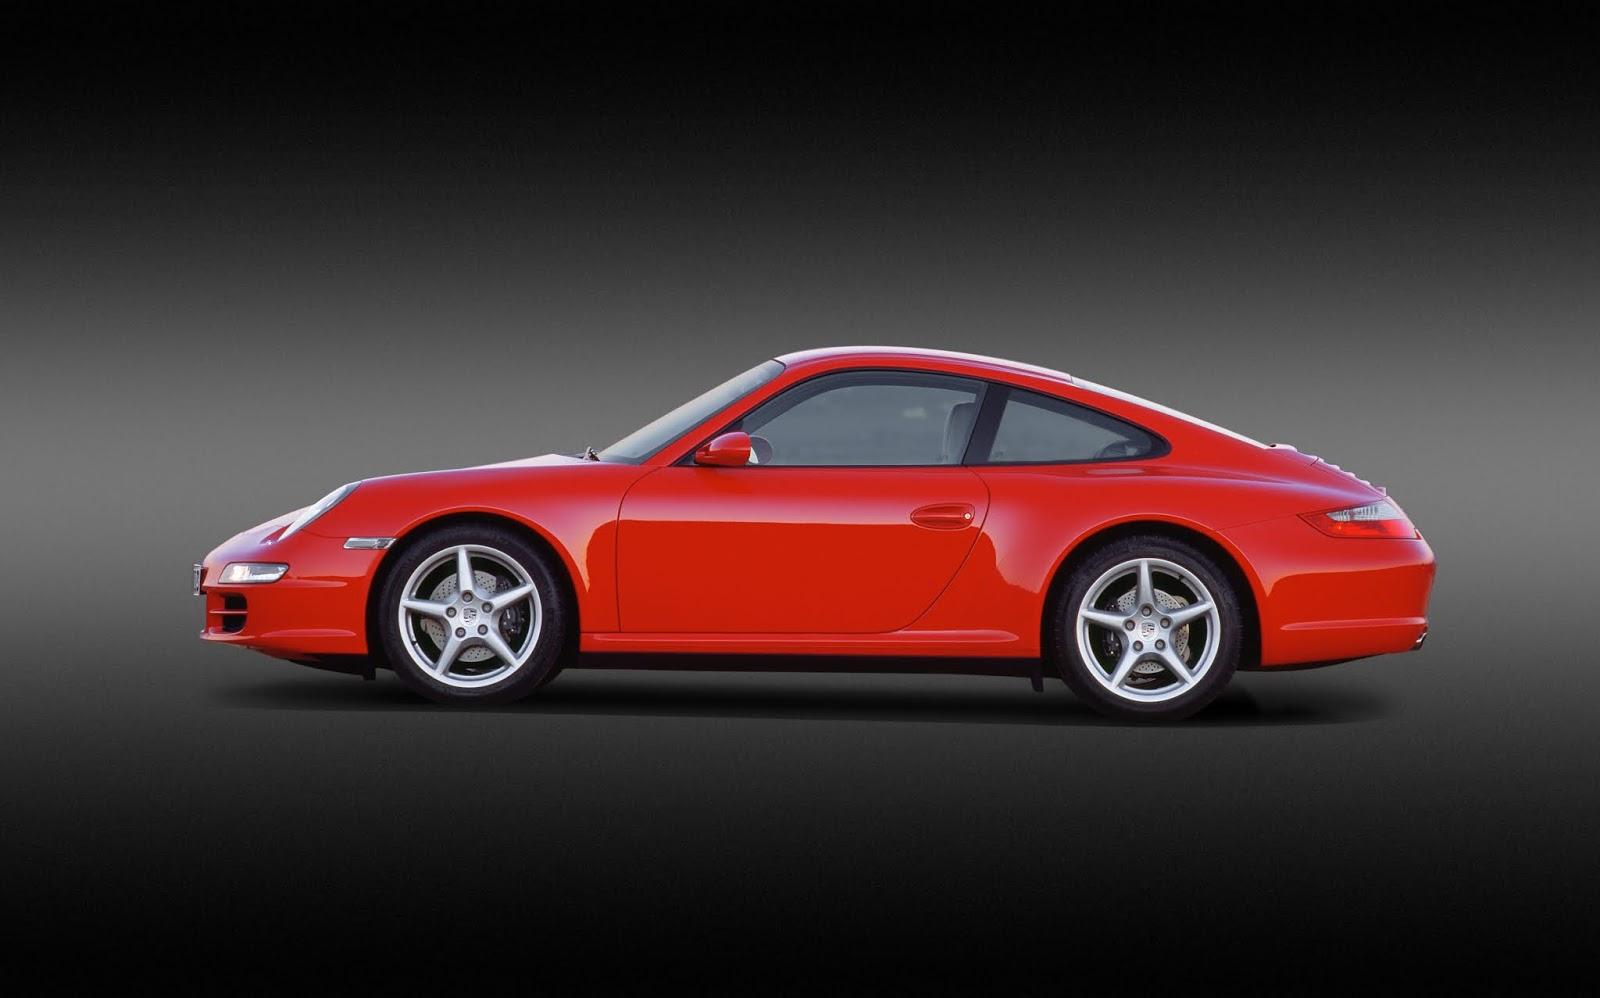 P13 0160 a4 rgb 1 Porsche Carrera GTS από την πίστα στον δρόμο videos